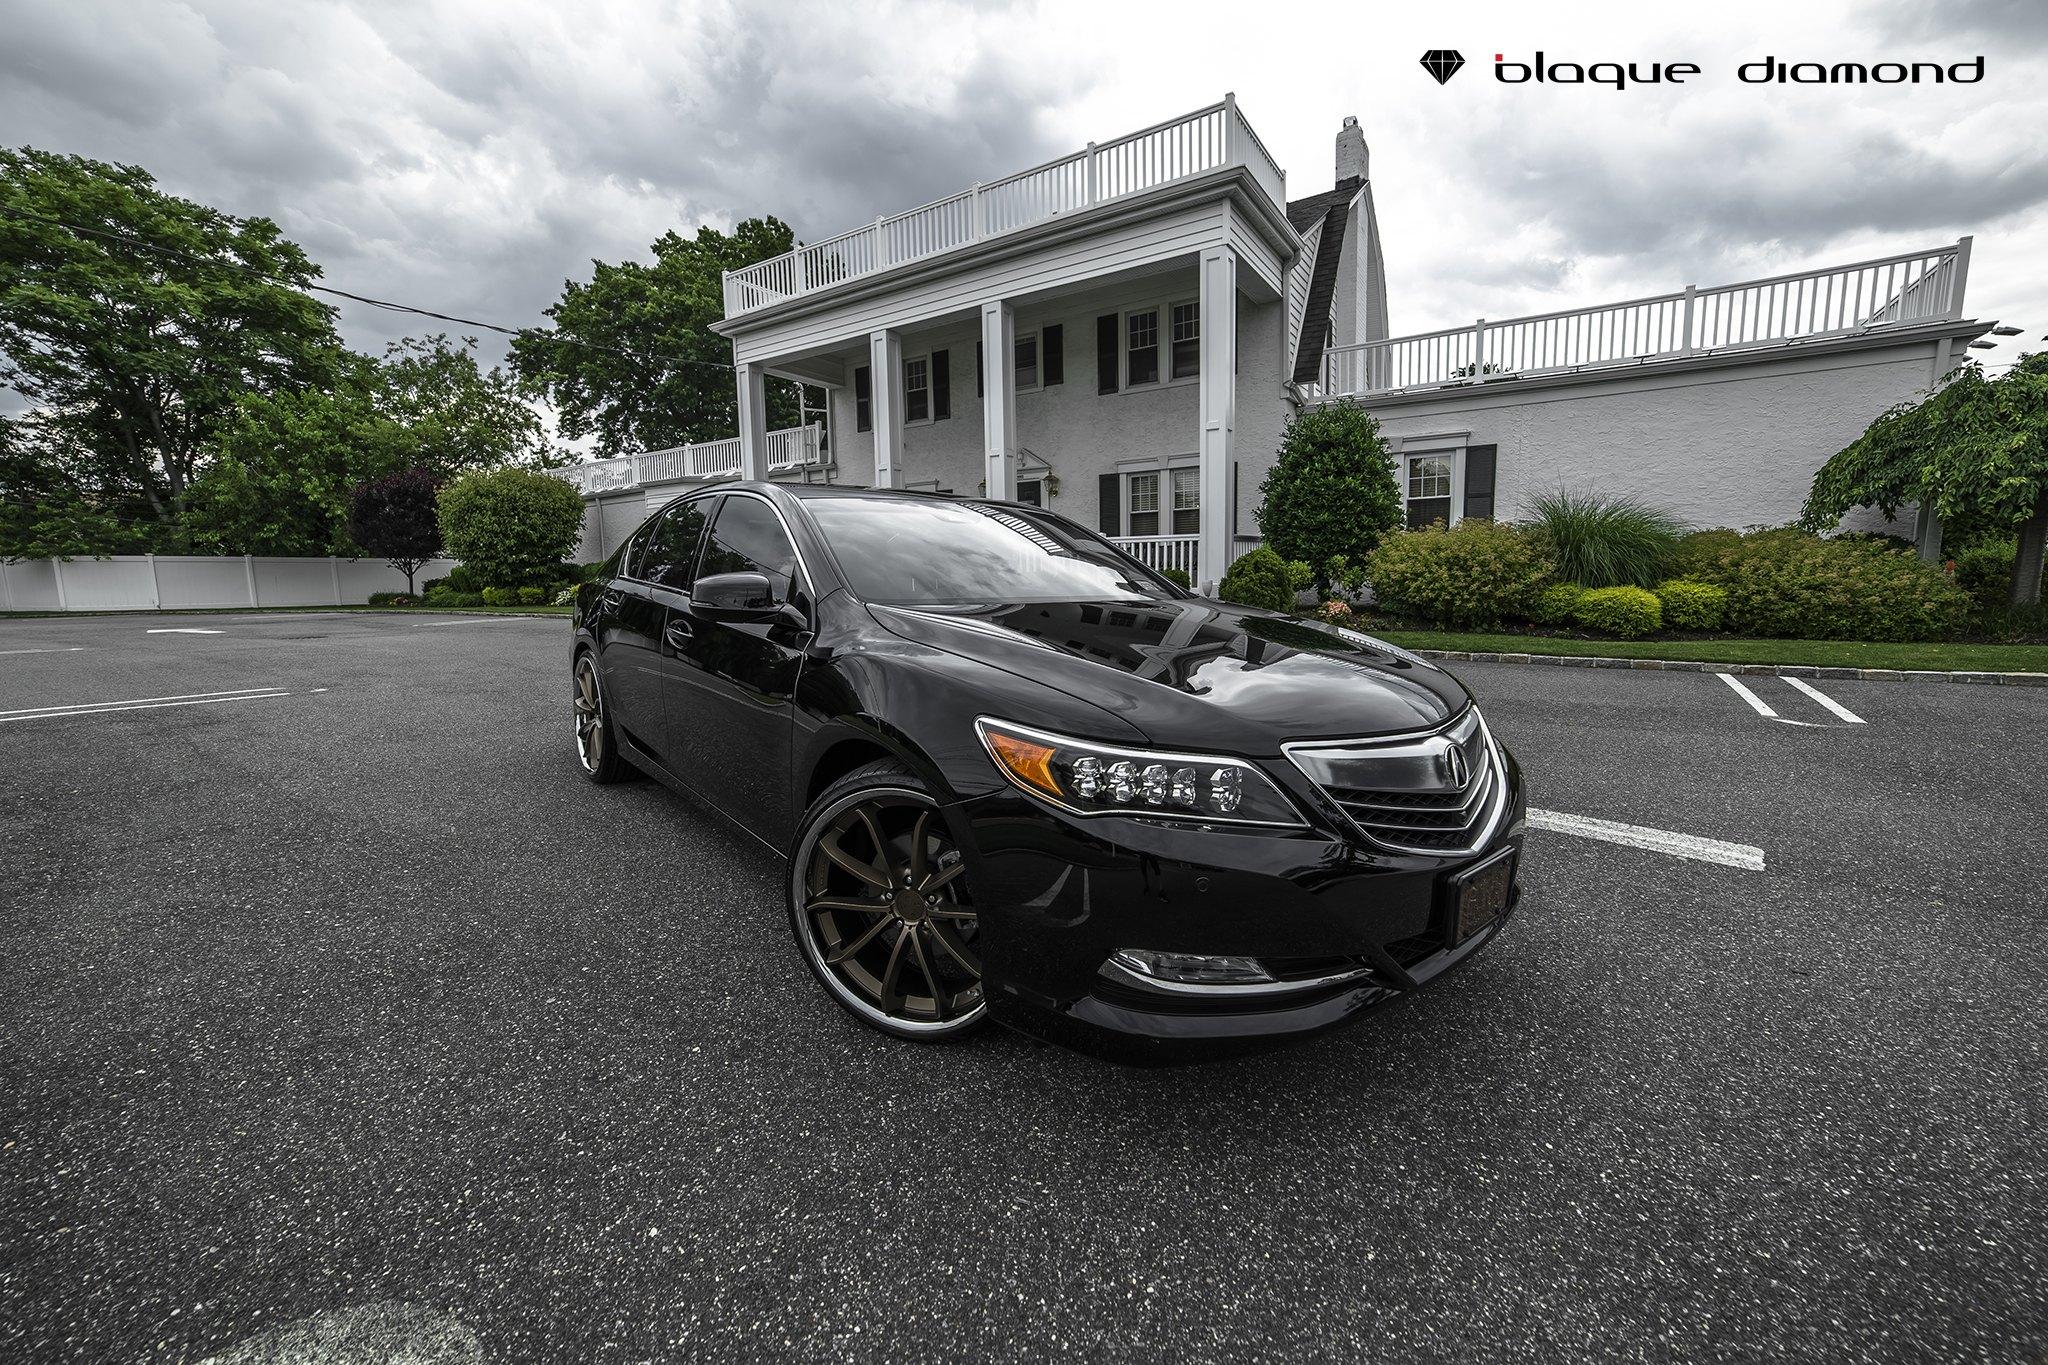 Blaque Diamond Rims Beautifying Black Acura RLX CARiDcom Gallery - Black acura rims